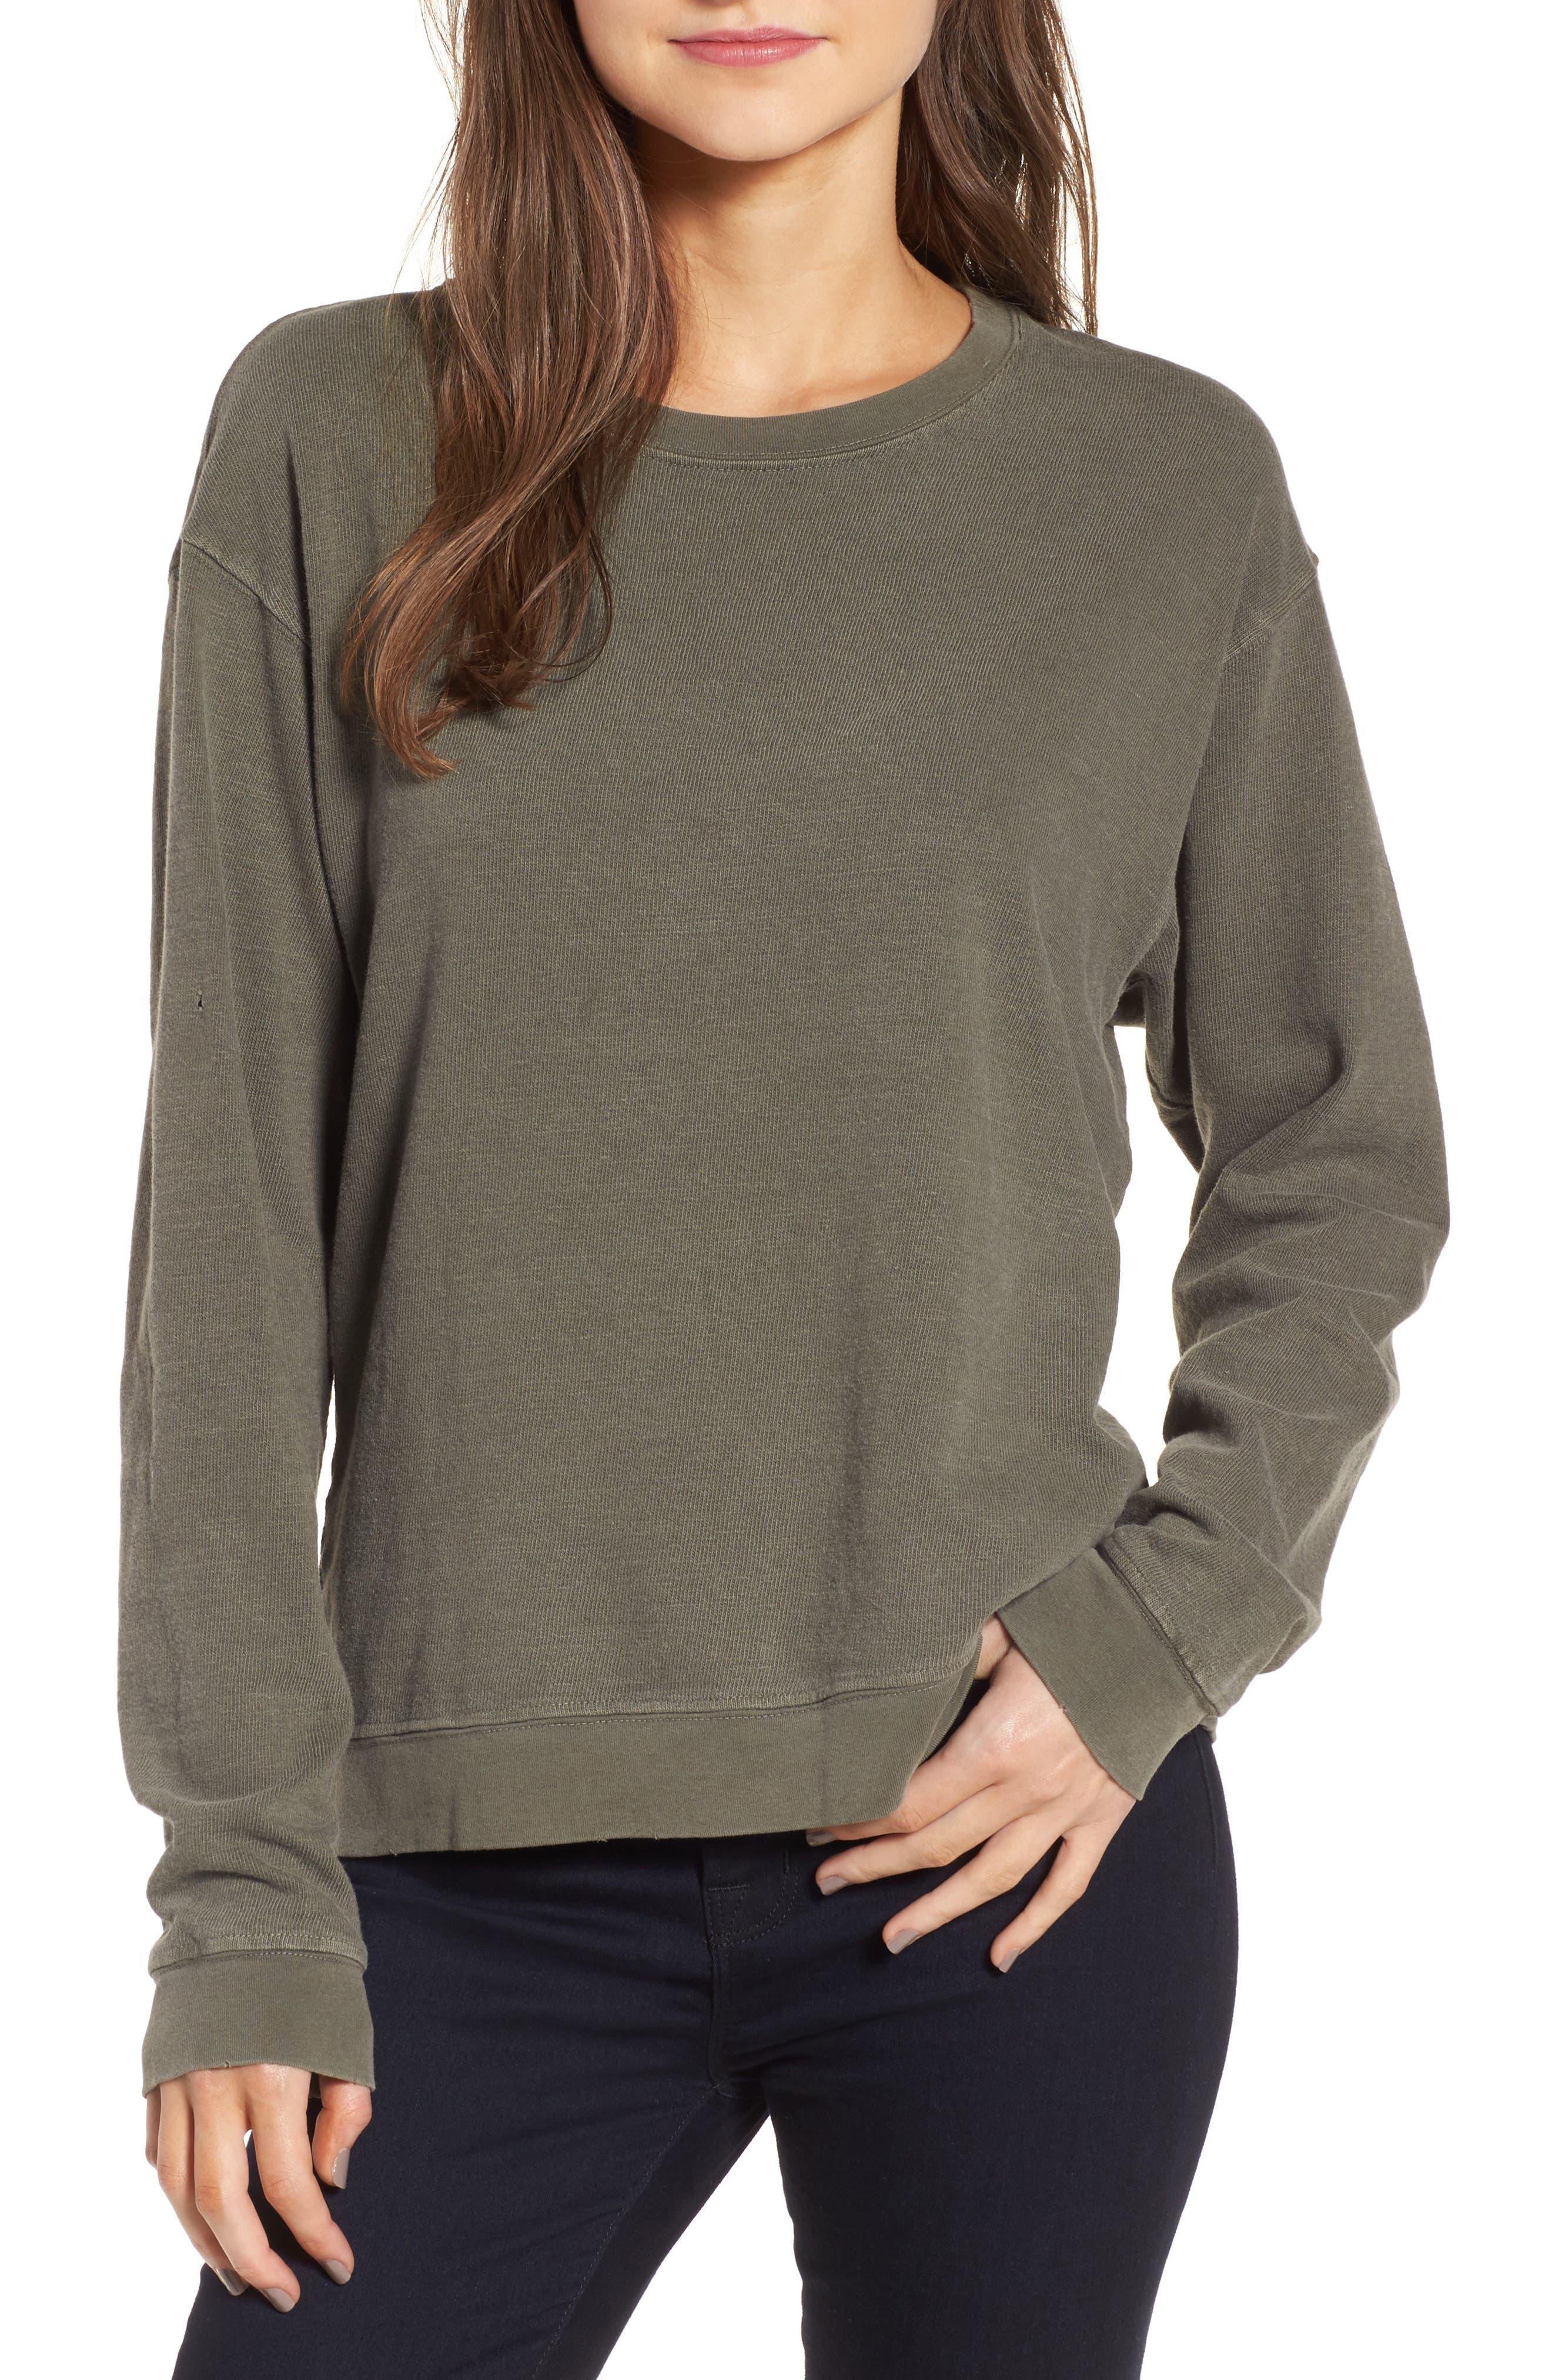 Alternate Image 1 Selected - James Perse Distressed Sweatshirt